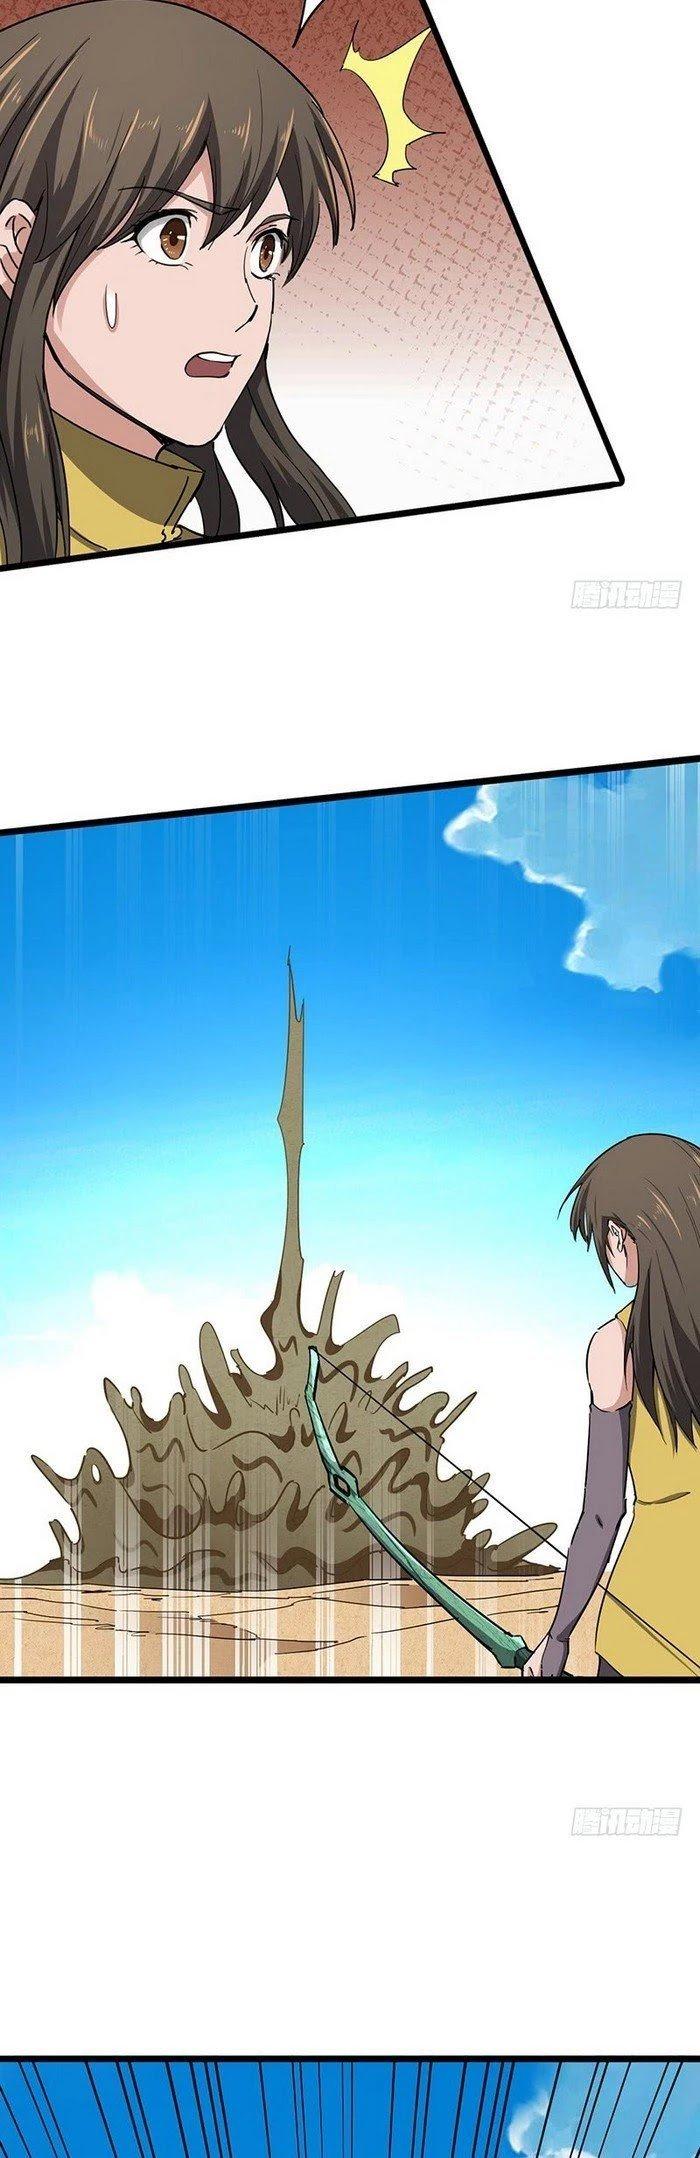 Manga Chaotic Sword God - Chapter 109 Page 13